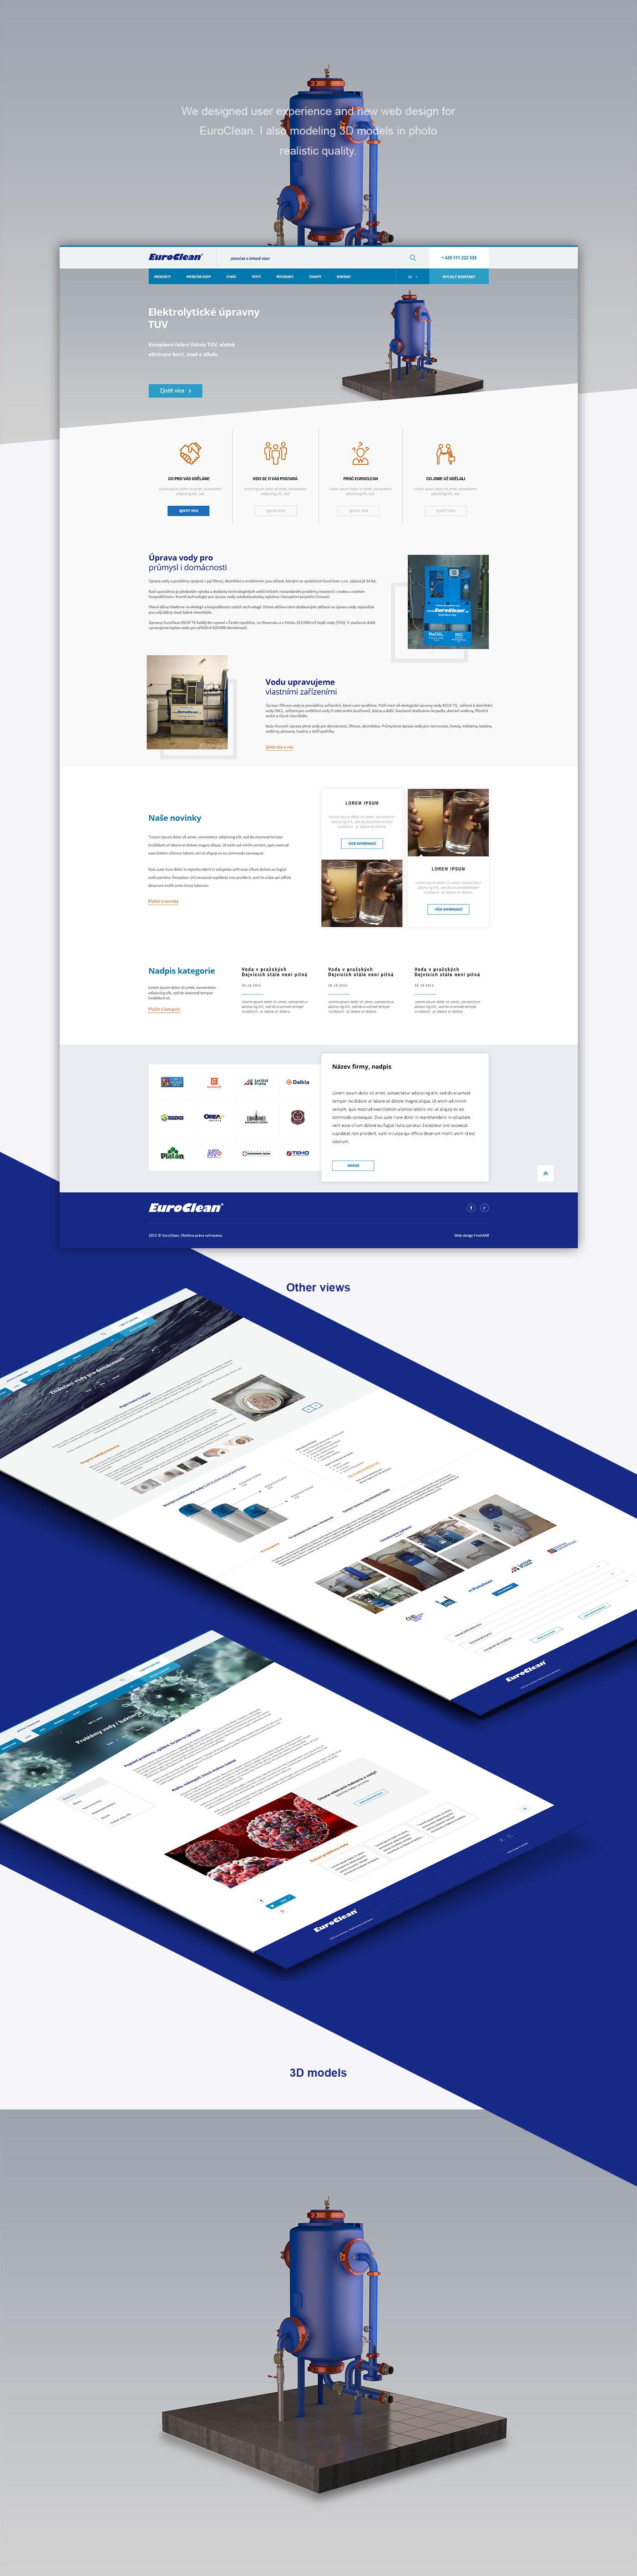 3D design Web graphic freshmill Website prague Webdesign CGI clean